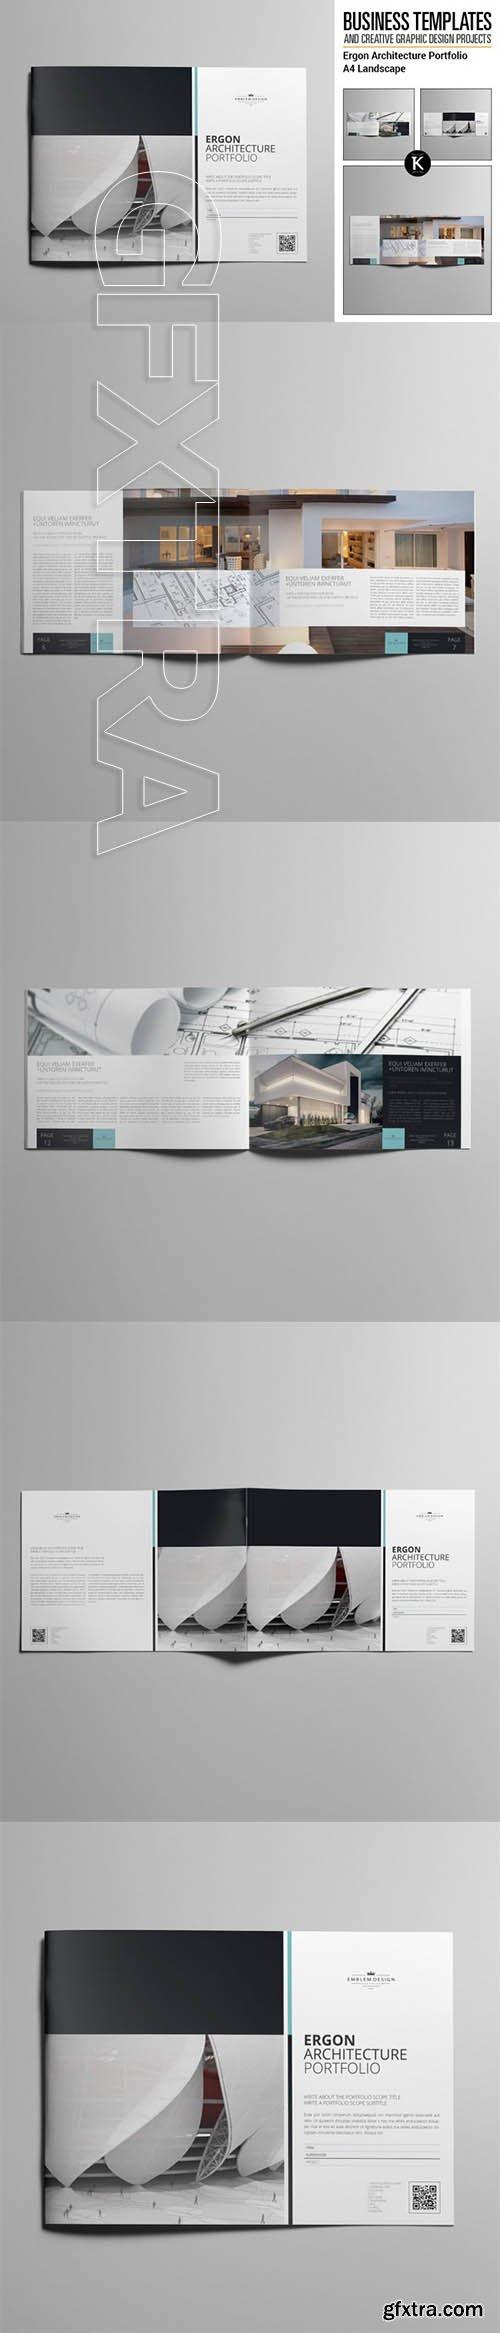 keboto - Ergon Architecture Portfolio A4 Landscape